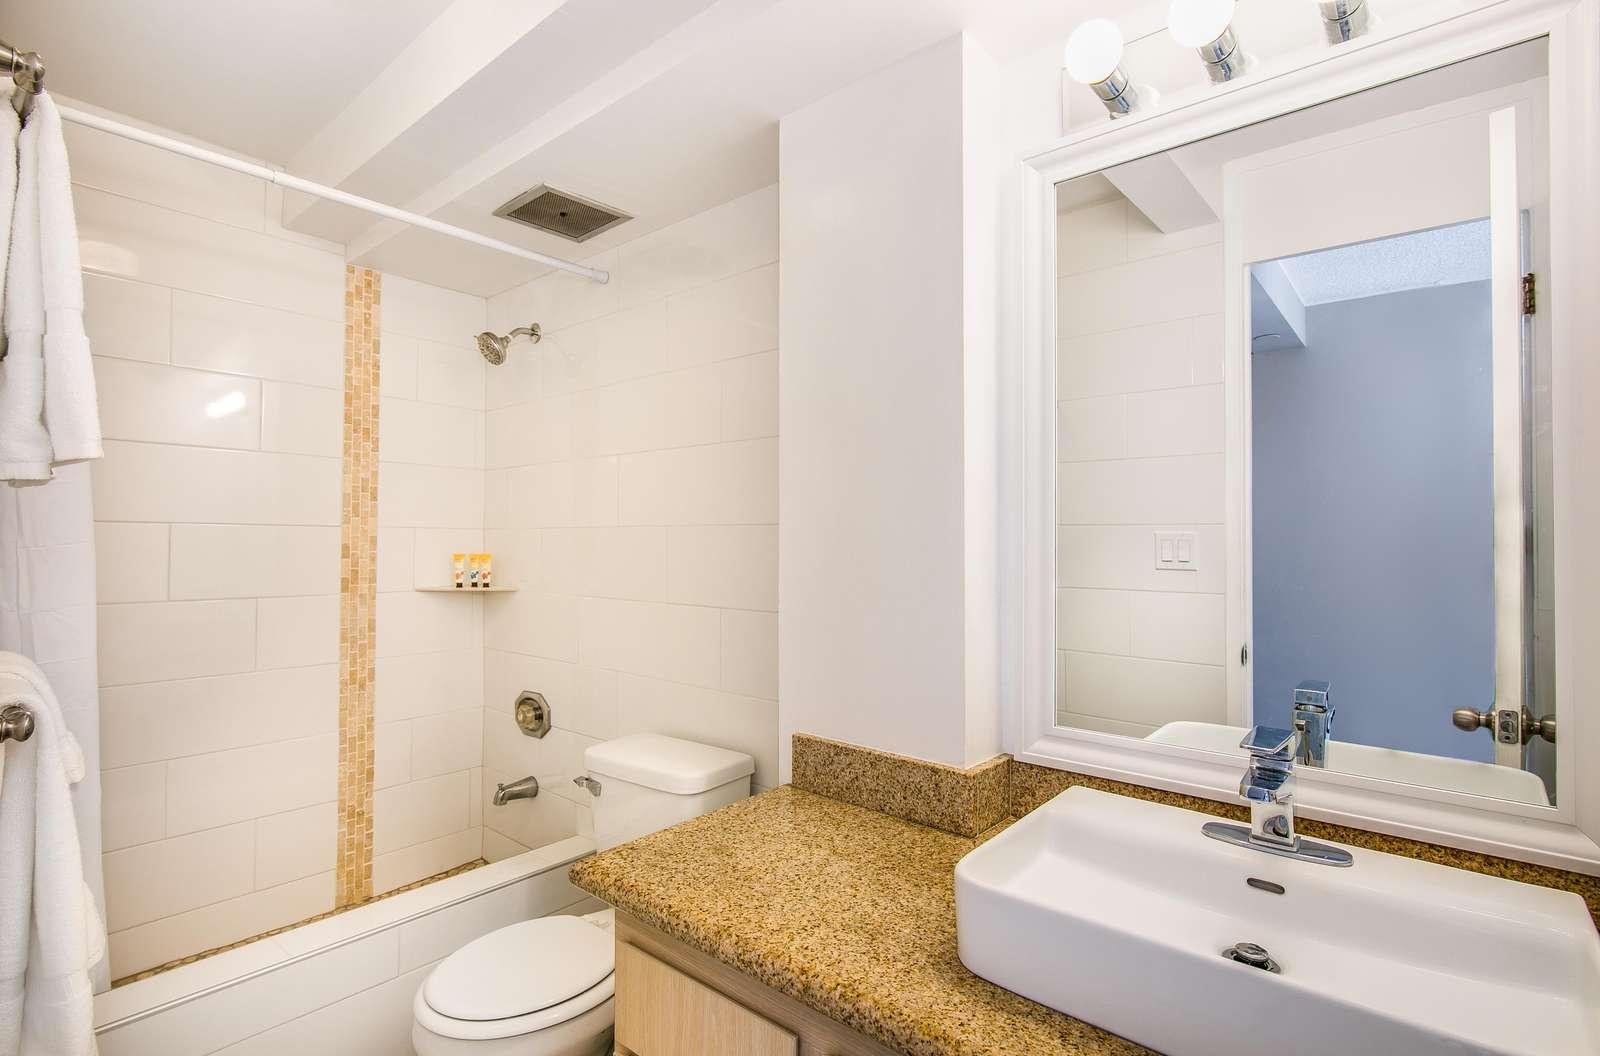 Bright Modern and super clean bathroom